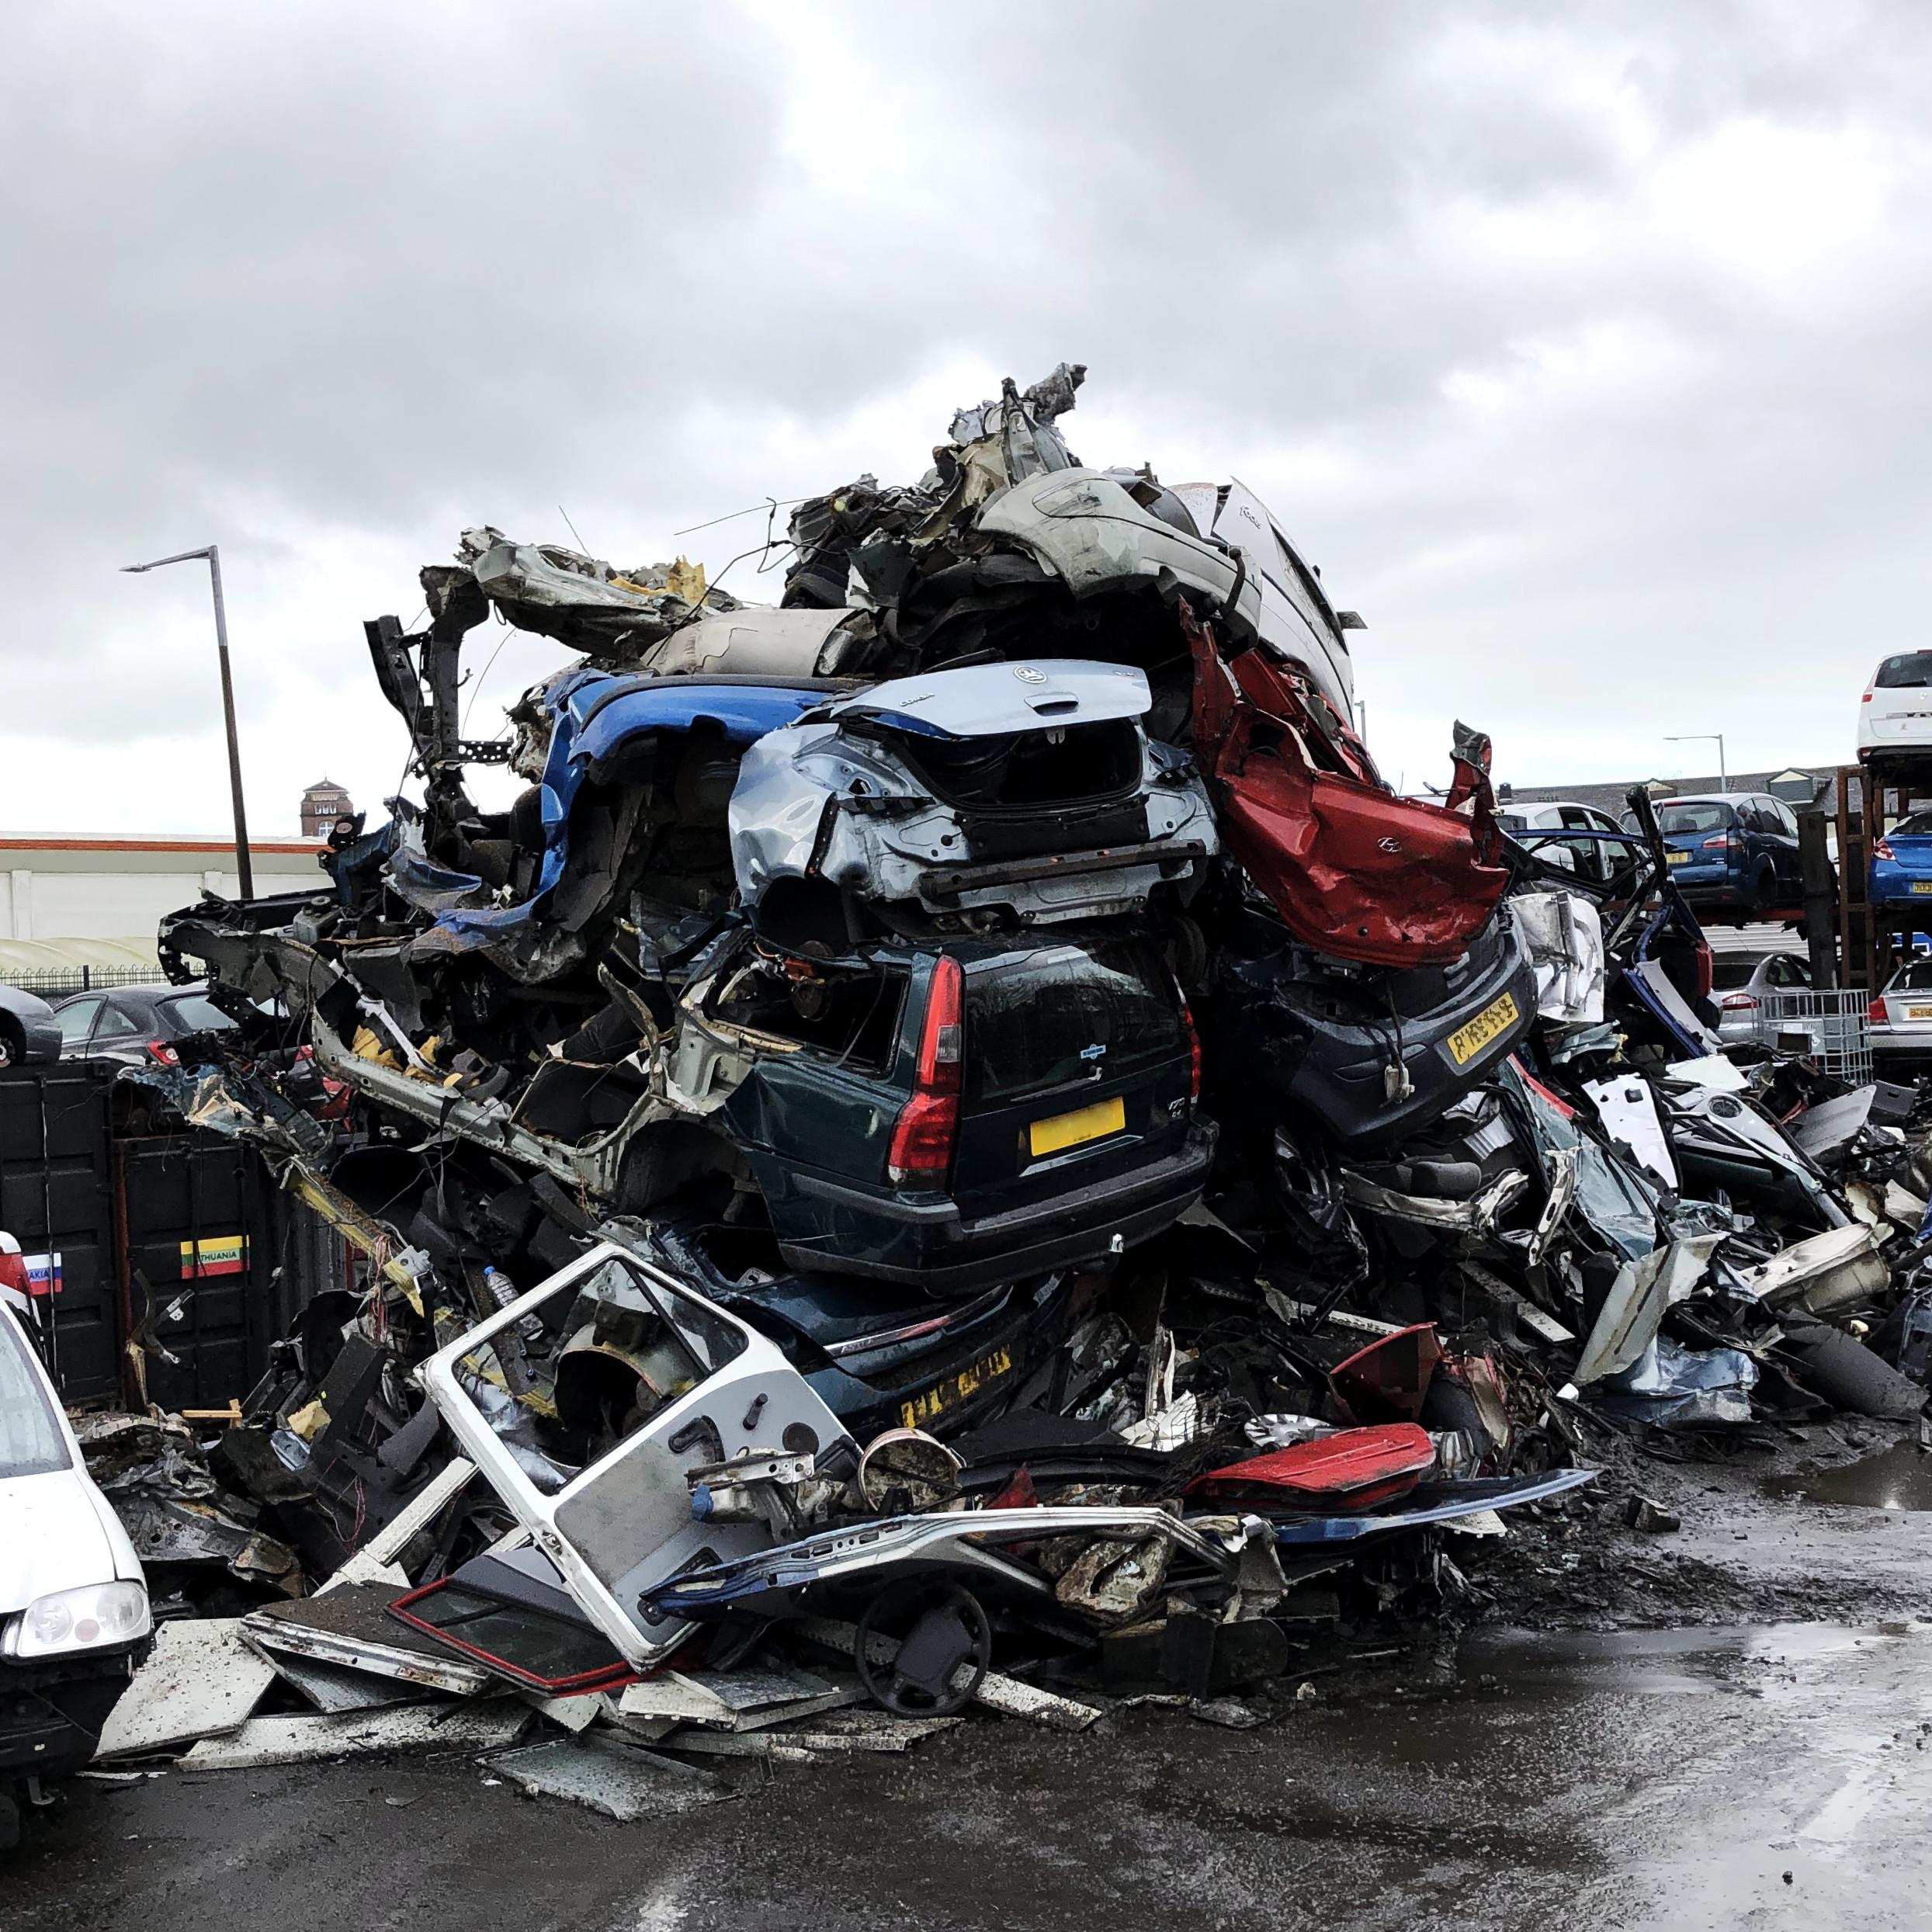 Where to scrap my car scrapmycars.co.uk